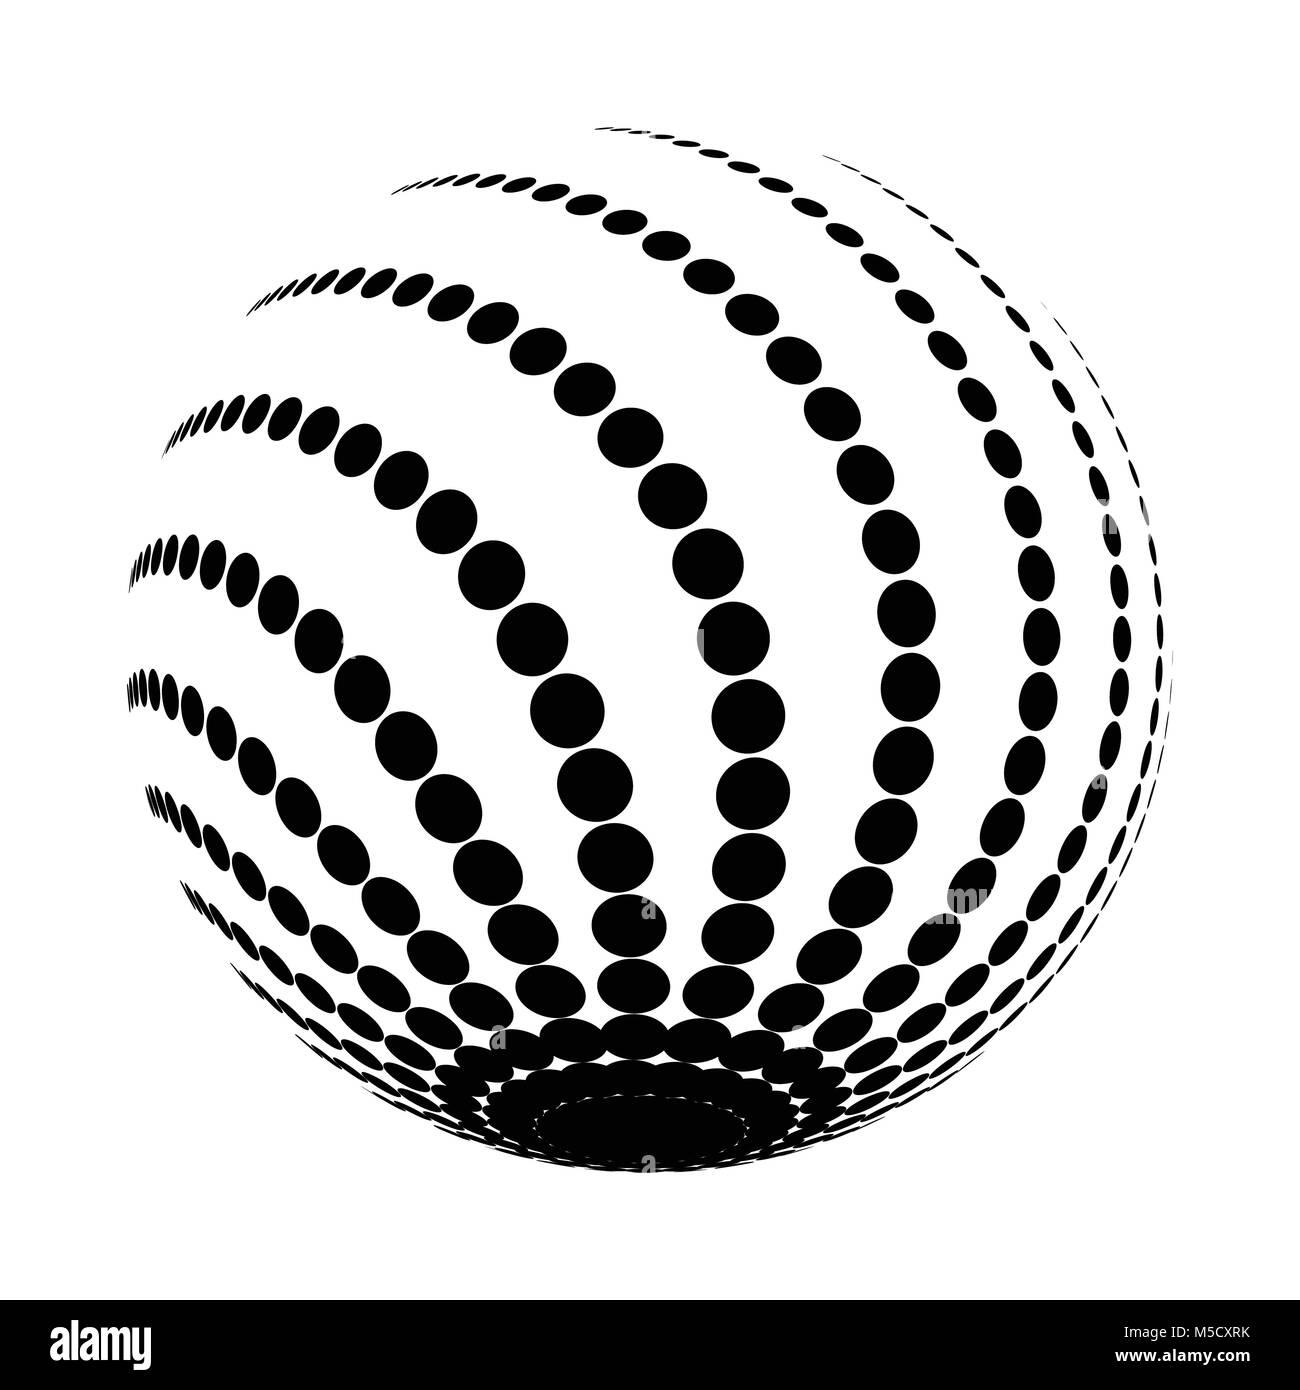 halftone black circle - Stock Image